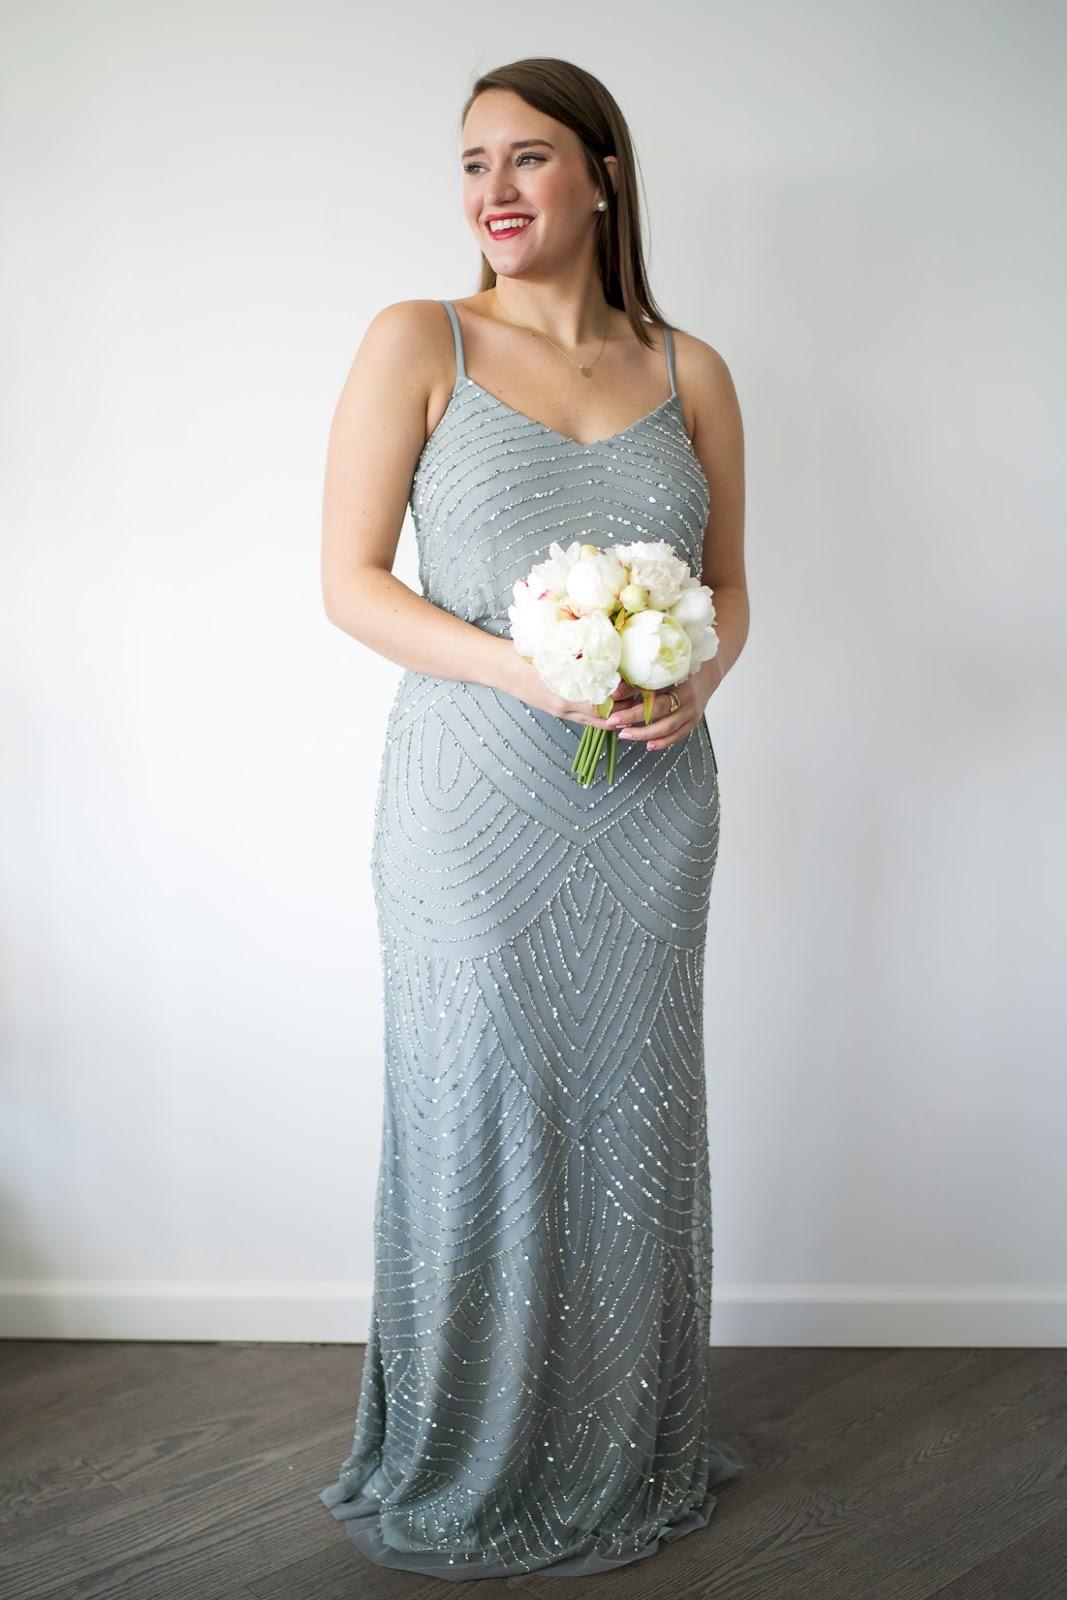 386341f288 Always a Bridesmaid | New York City Fashion and Lifestyle Blog ...